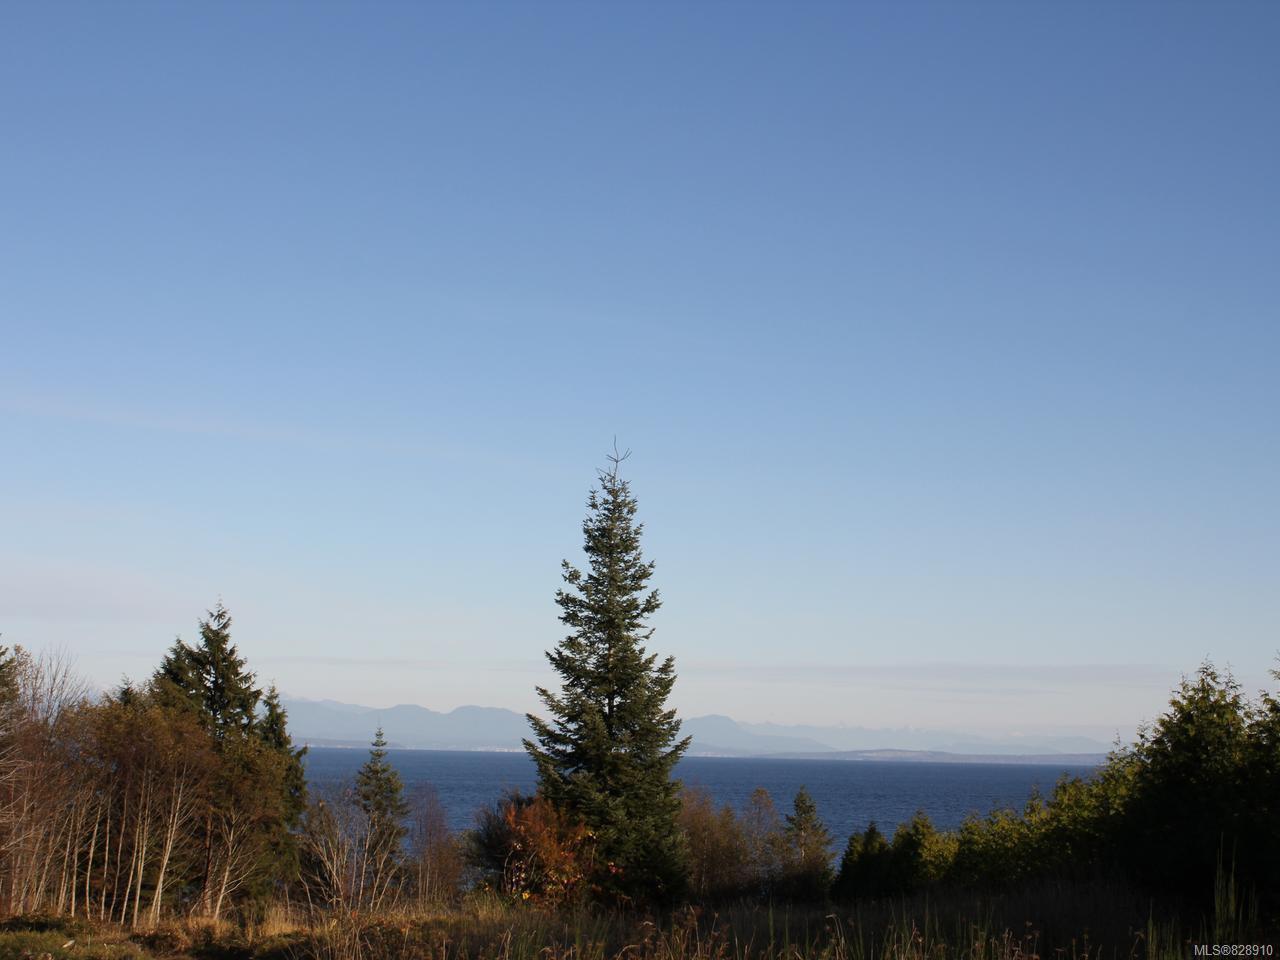 Main Photo: 6491 EAGLES DRIVE in COURTENAY: CV Courtenay North Land for sale (Comox Valley)  : MLS®# 828910